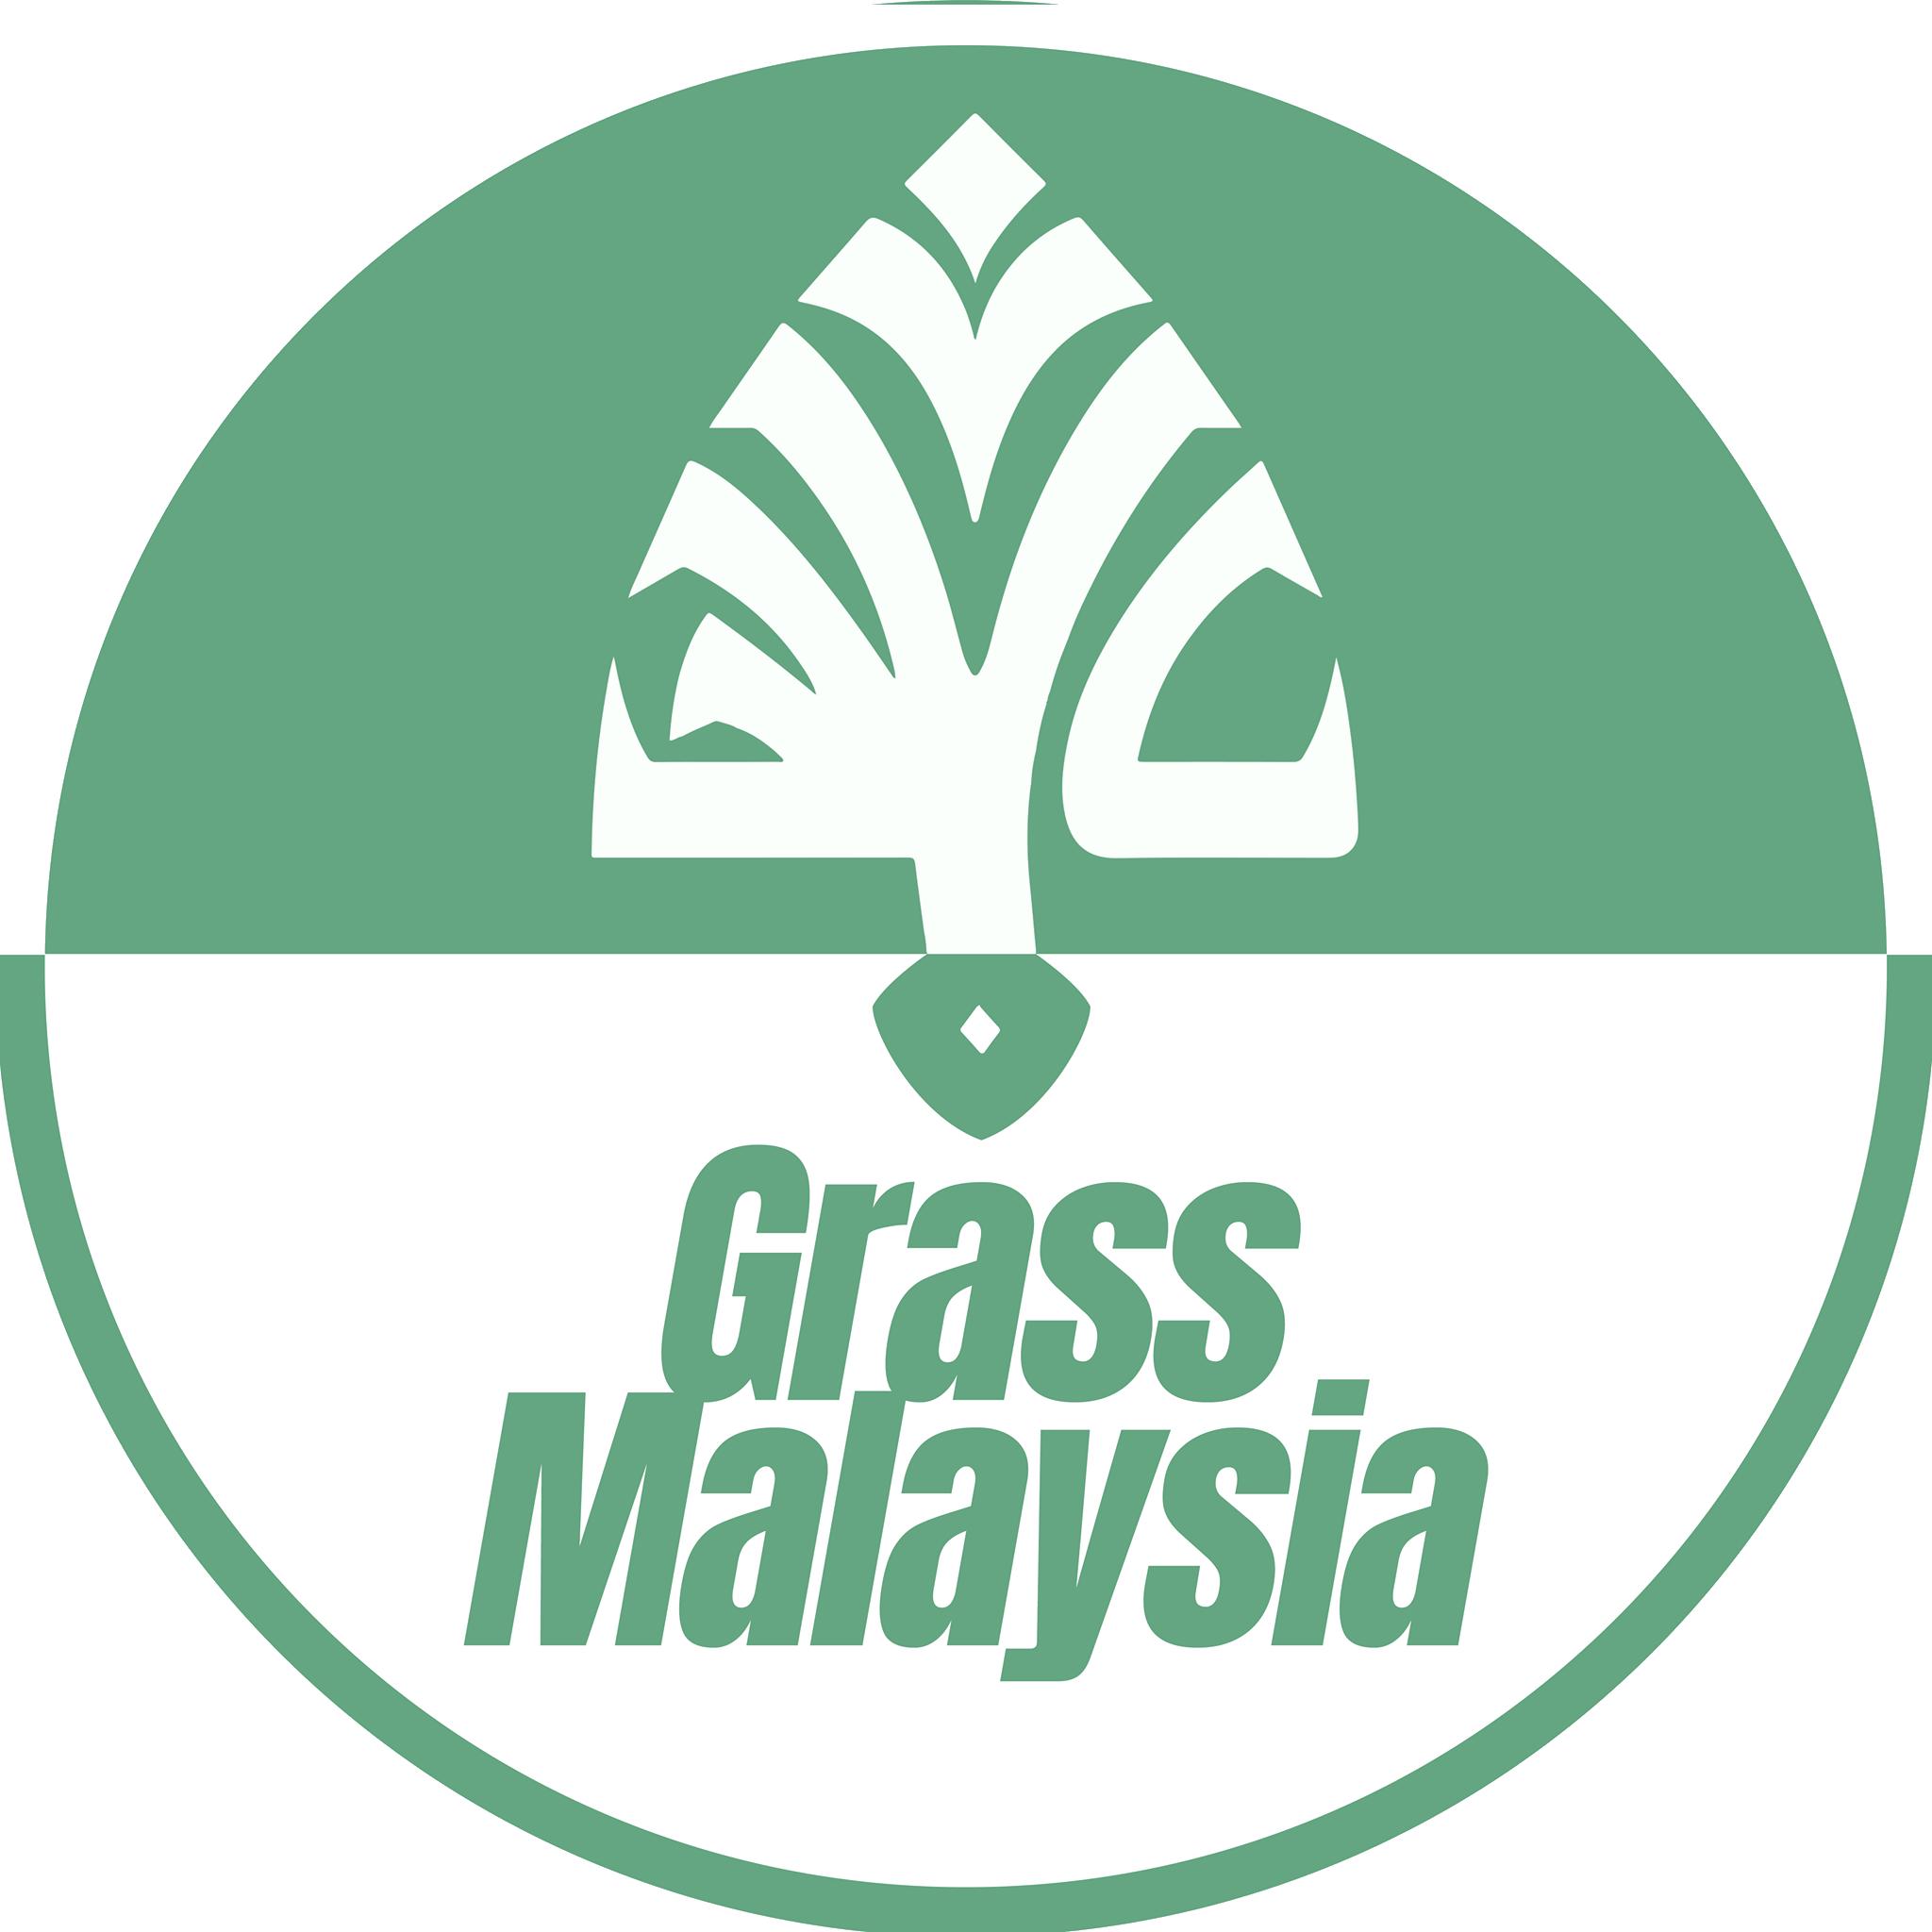 Alam: GRASS